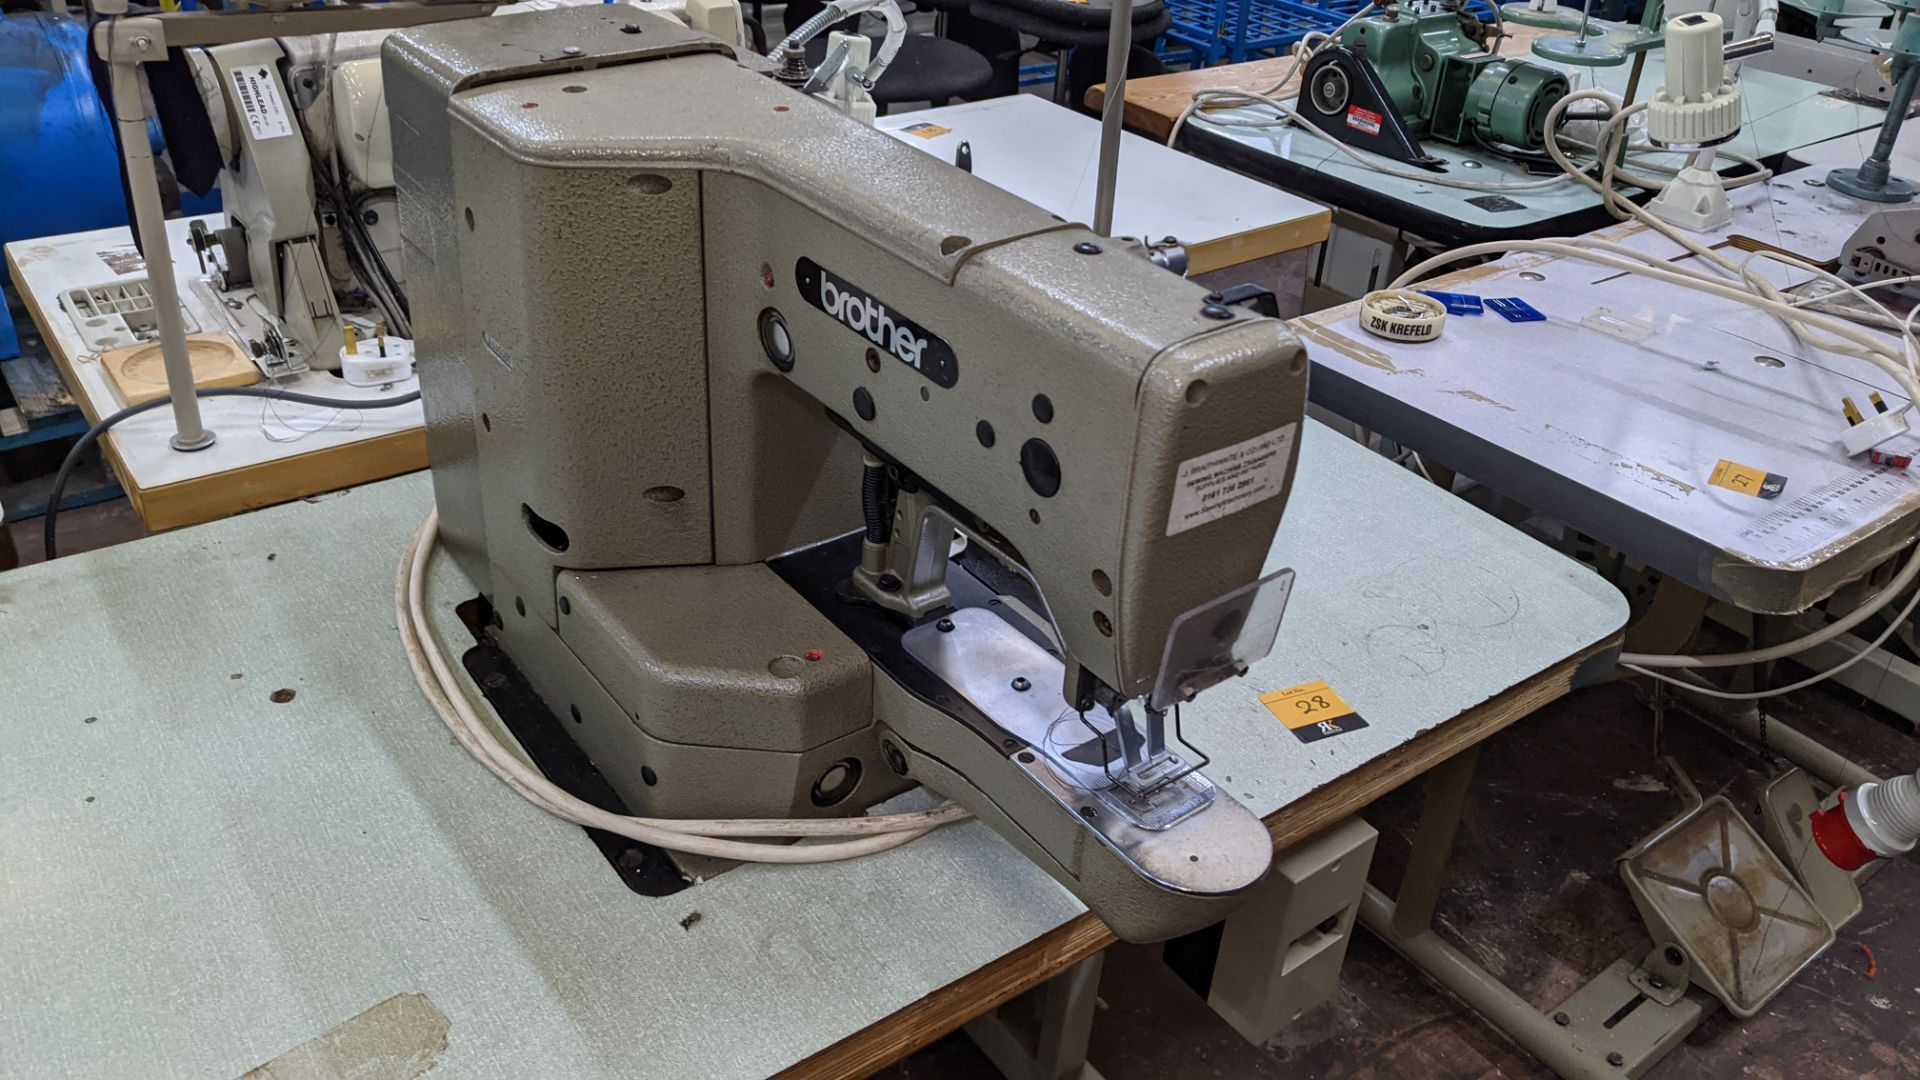 Brother bar tack sewing machine model LK3-B430-2 - Image 9 of 15